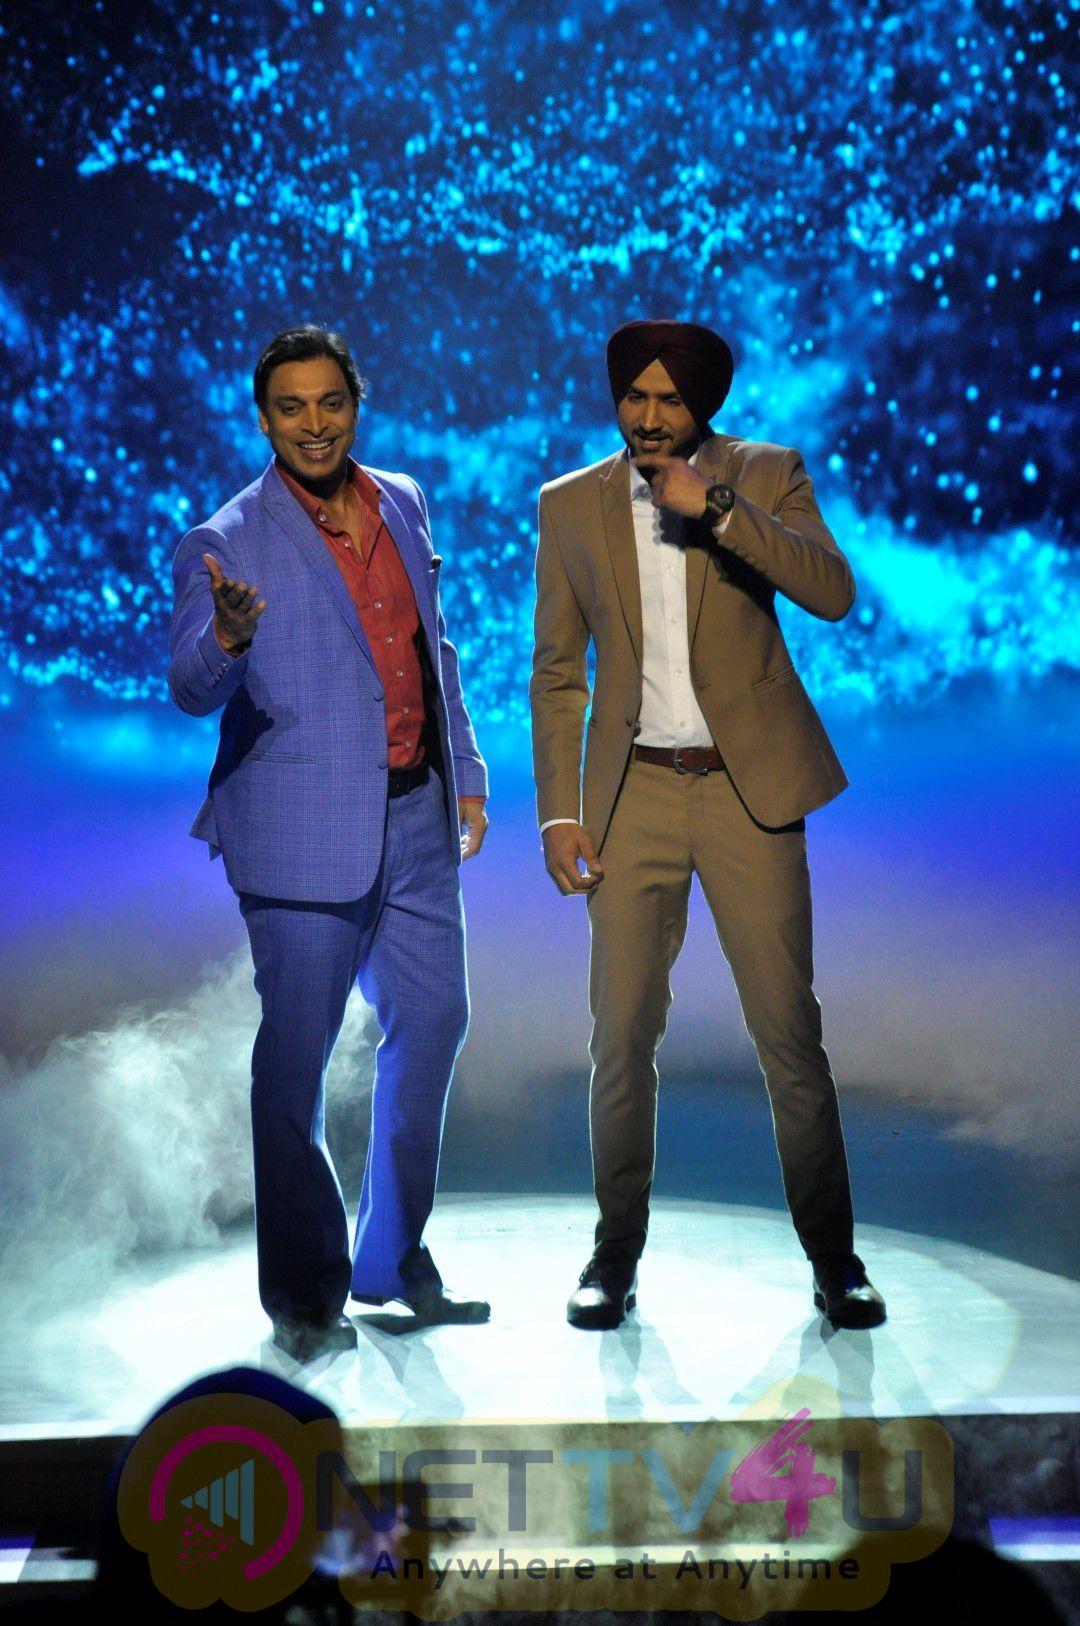 Promo Shoot Of Mazak Mazak Mein With Harbhajan Singh & Shoaib Akhtar Elegant Photos